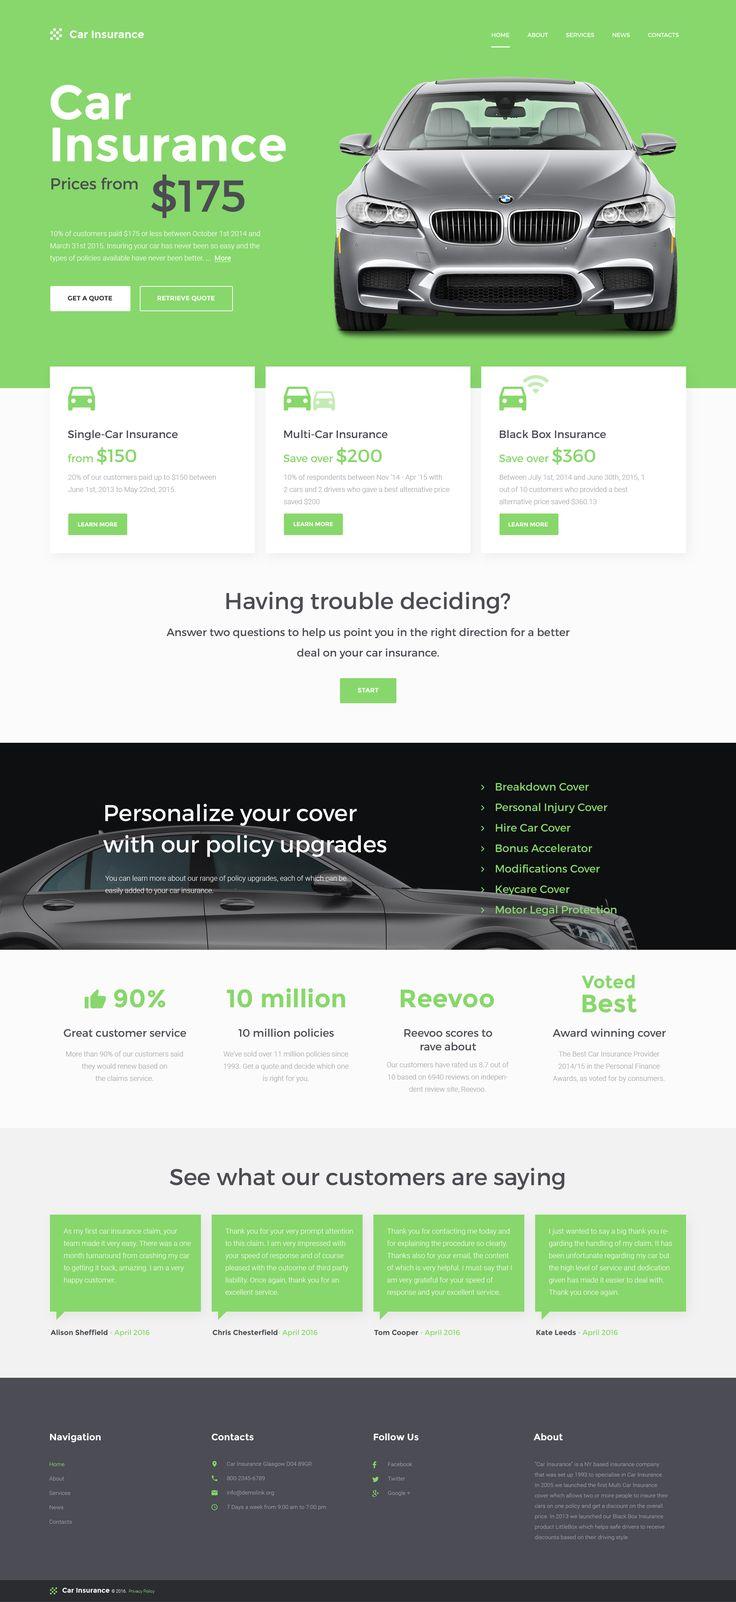 Car Insurance Responsive Website Template #57558 http://www.templatemonster.com/website-templates/car-insurance-responsive-website-template-57558.html